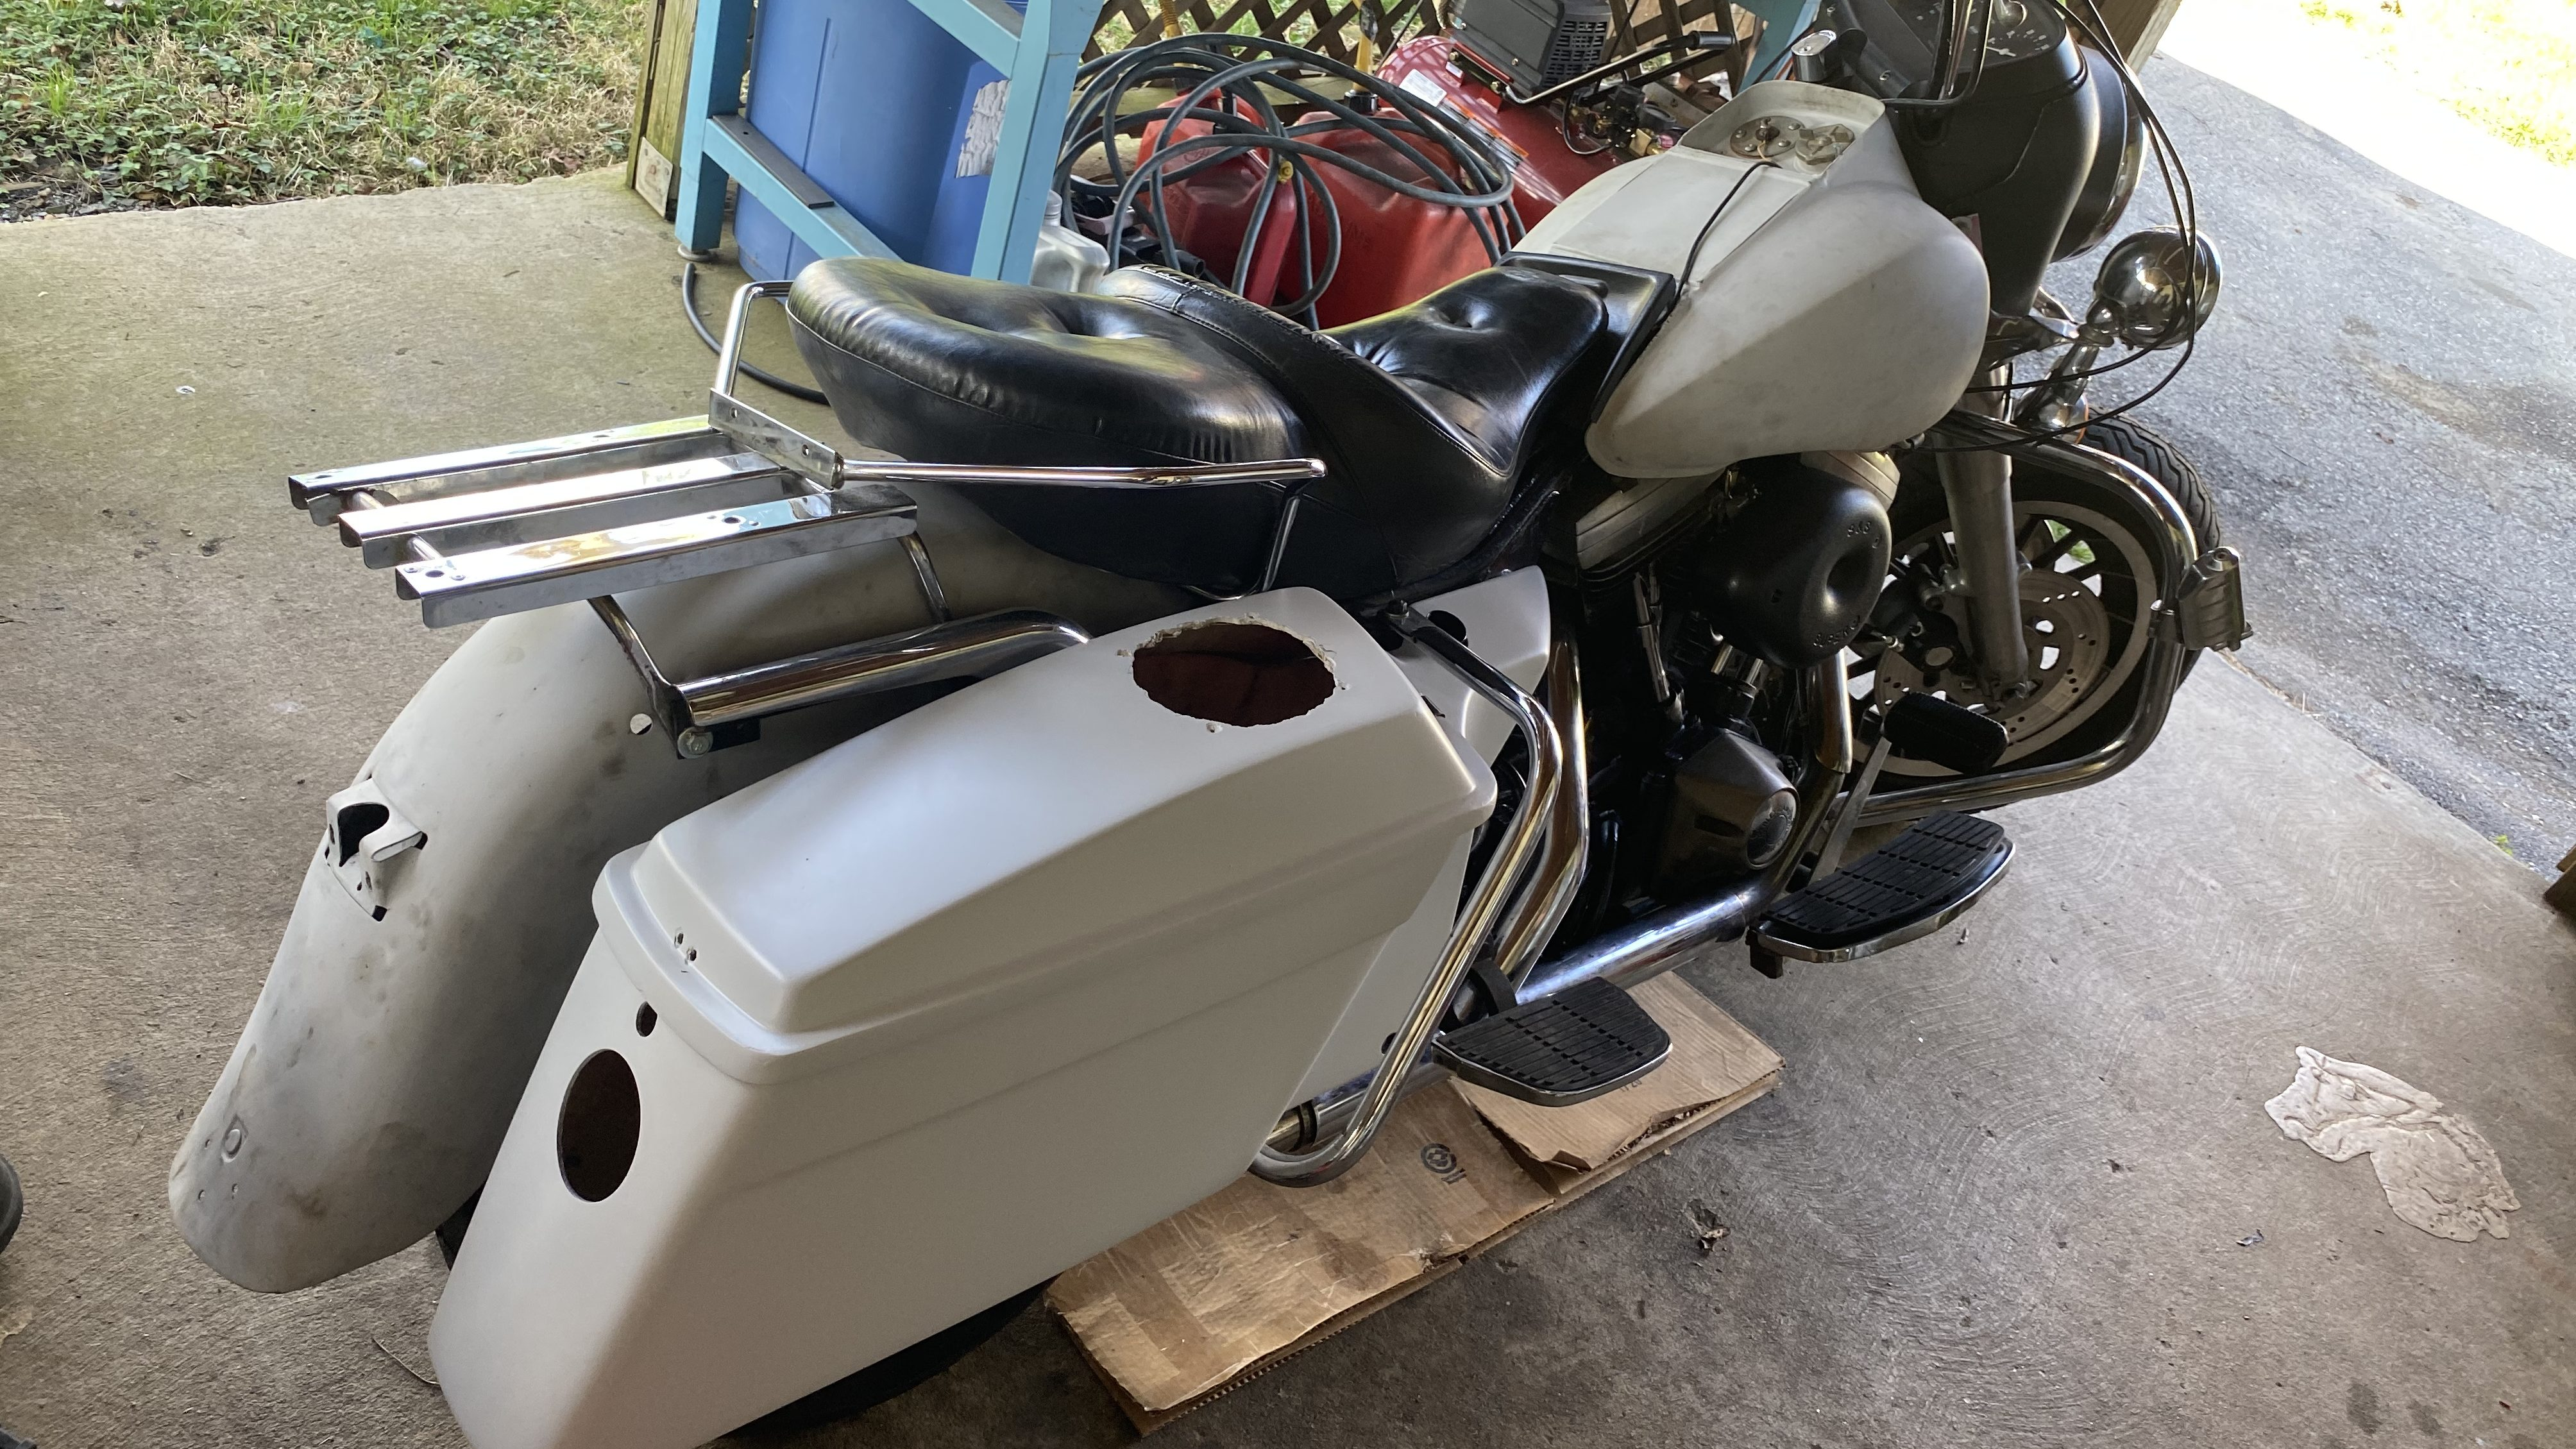 1984 Harley Davidson Tour Glide Classic